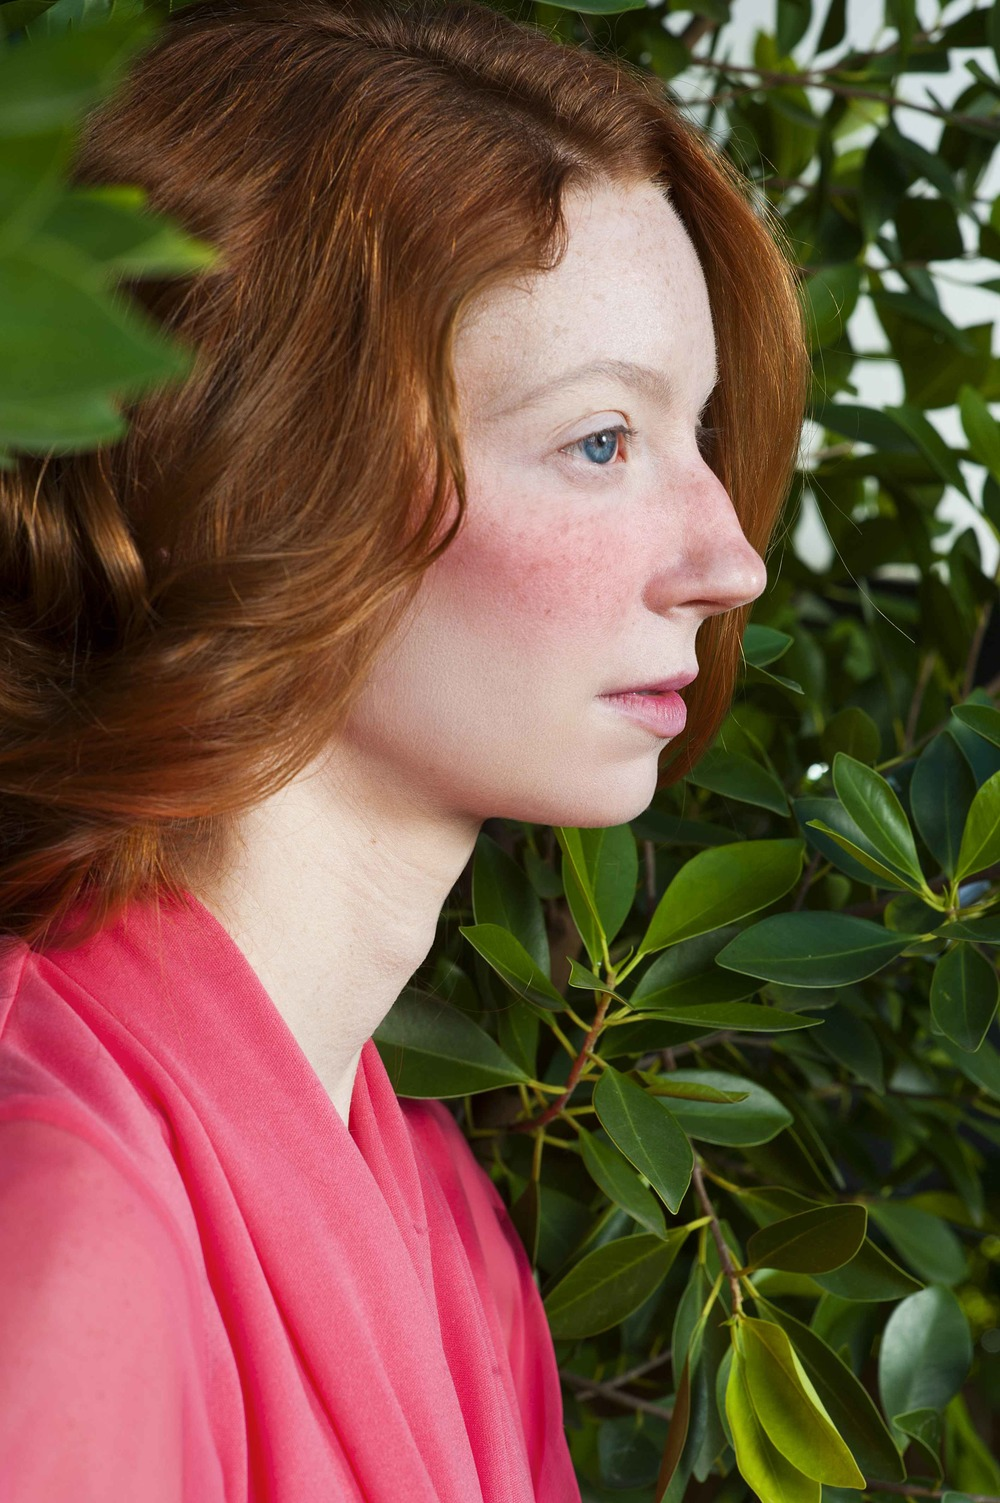 RNJ_4994-ret-no freckles 2.jpg